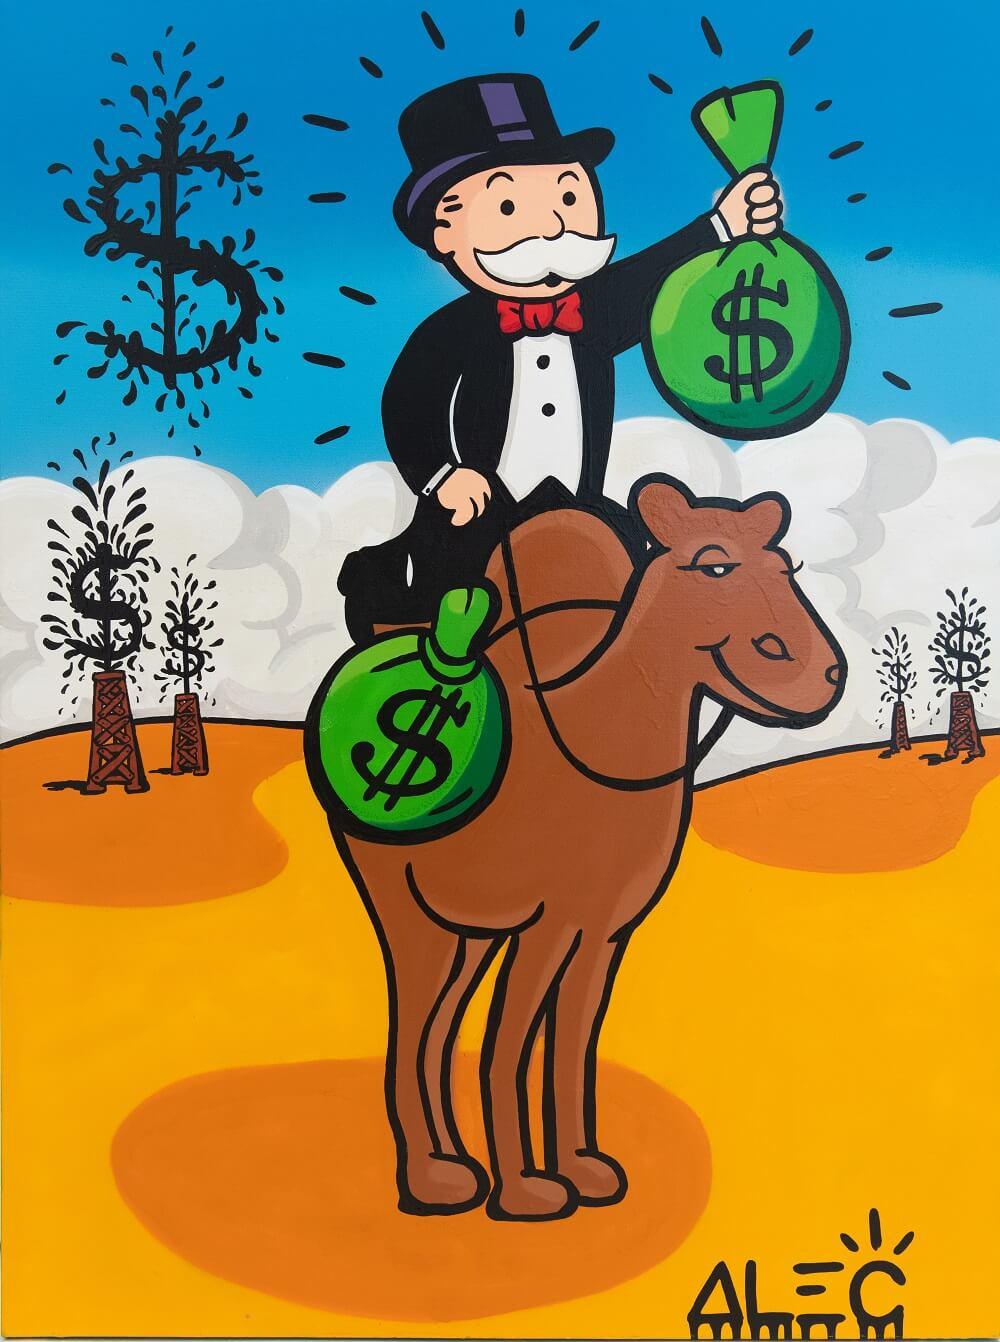 Monopoly $ Bags on Camel - Alec Monopoly - Eden Gallery